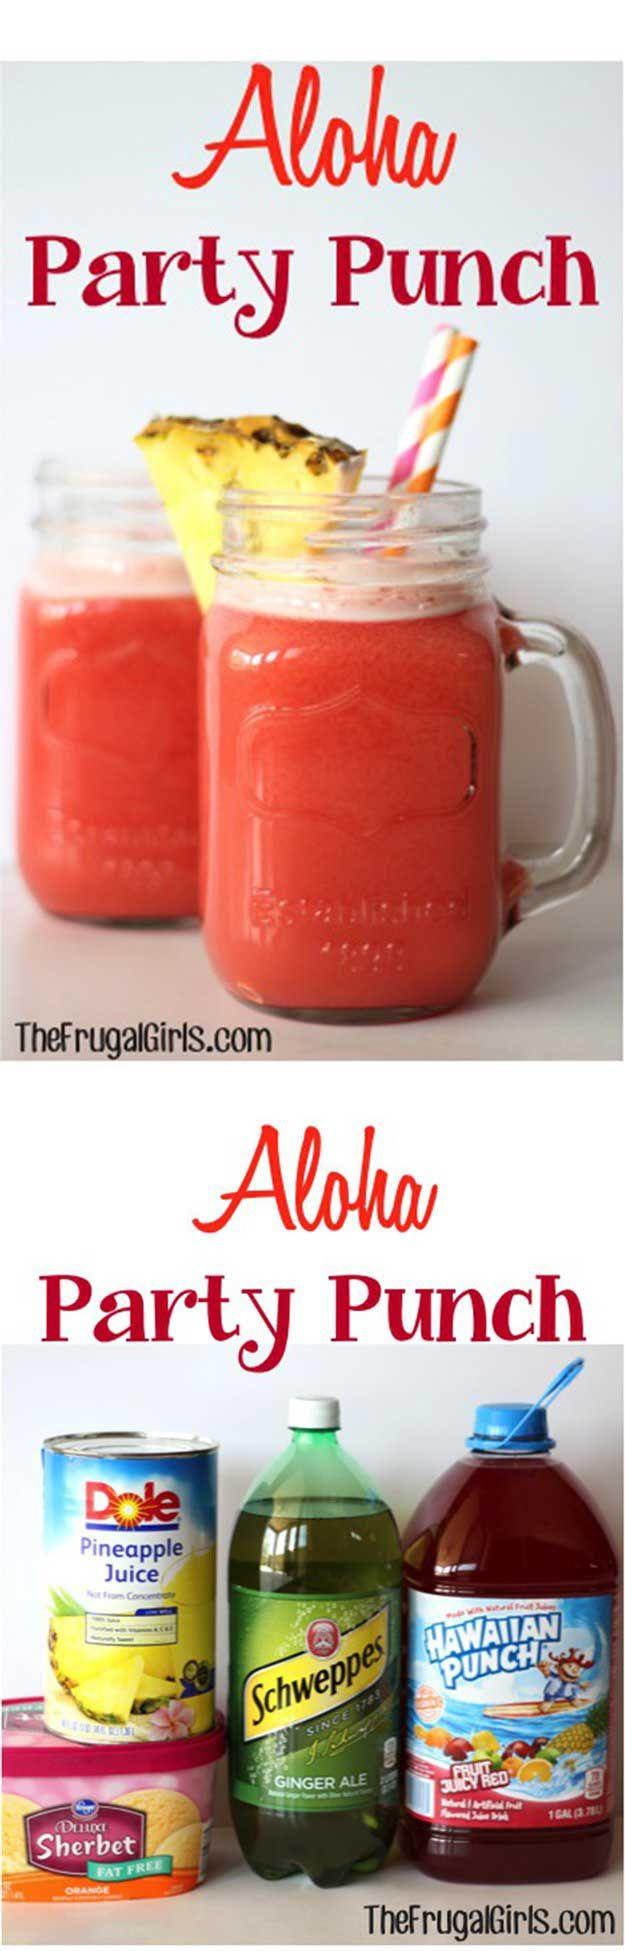 Aloha Party Punch | Amazing DIY Beach Party Ideas